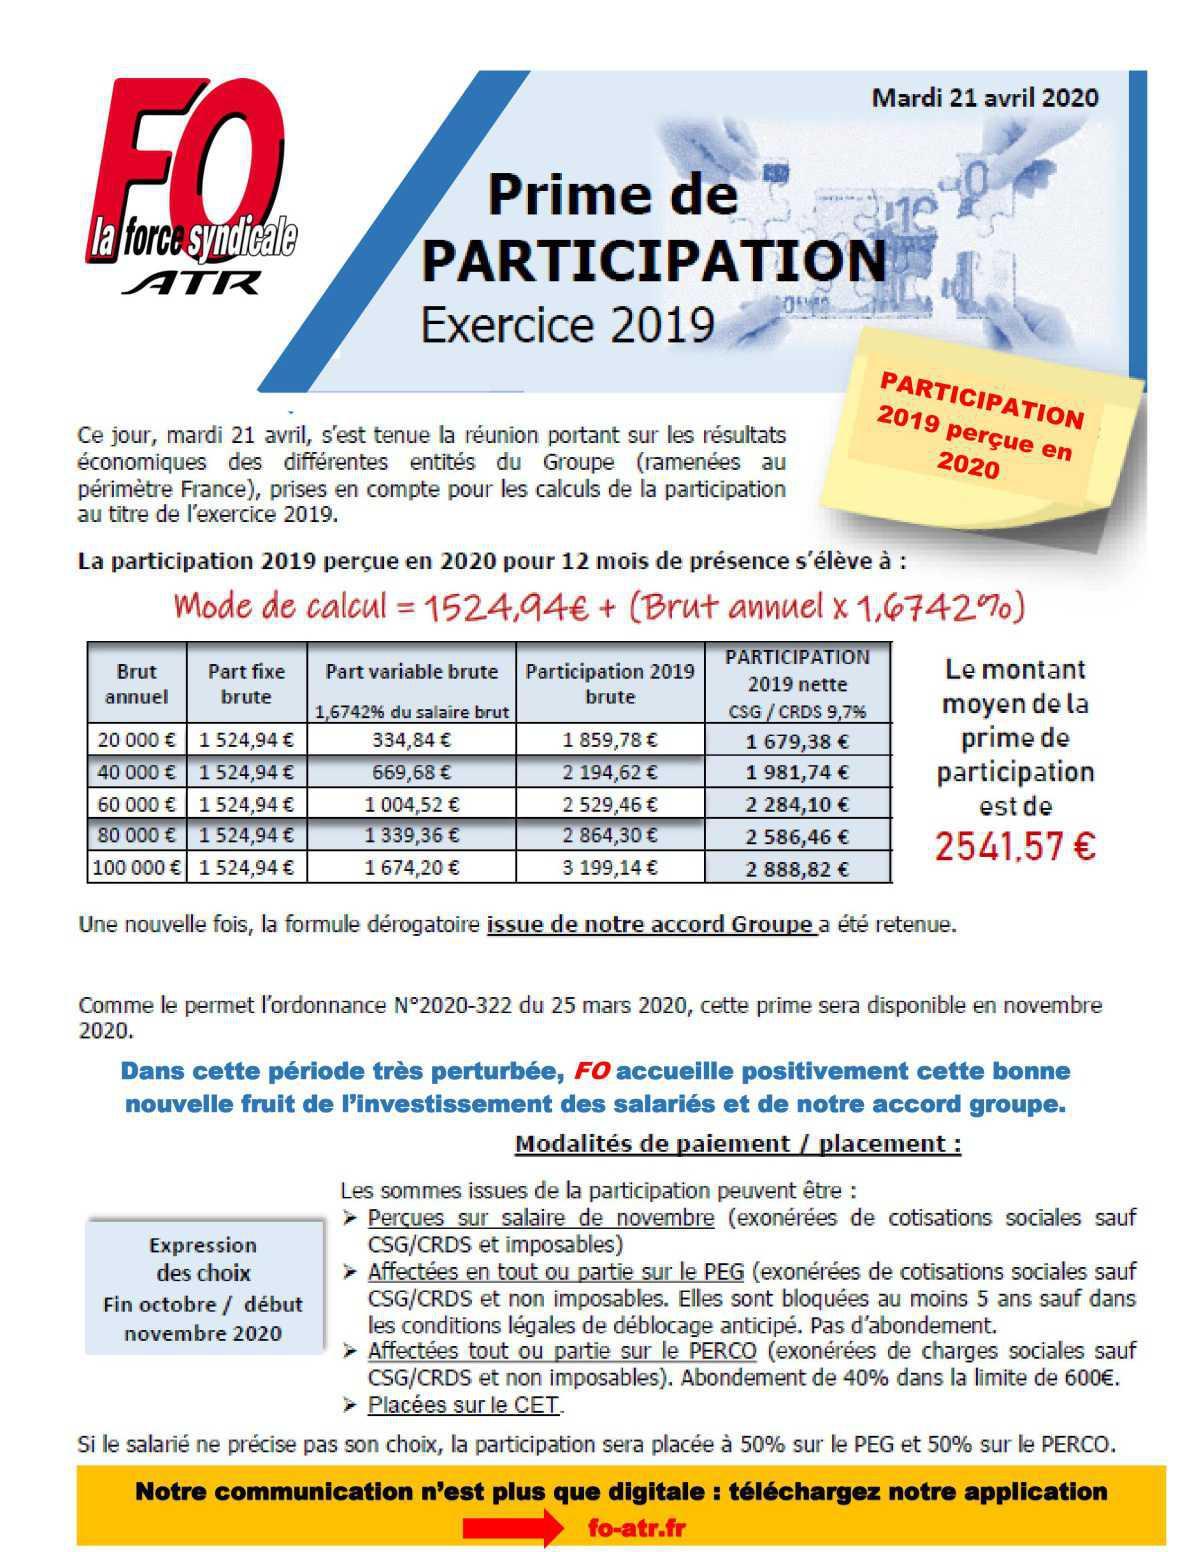 PARTICIPATION 2020 (exercice 2019)